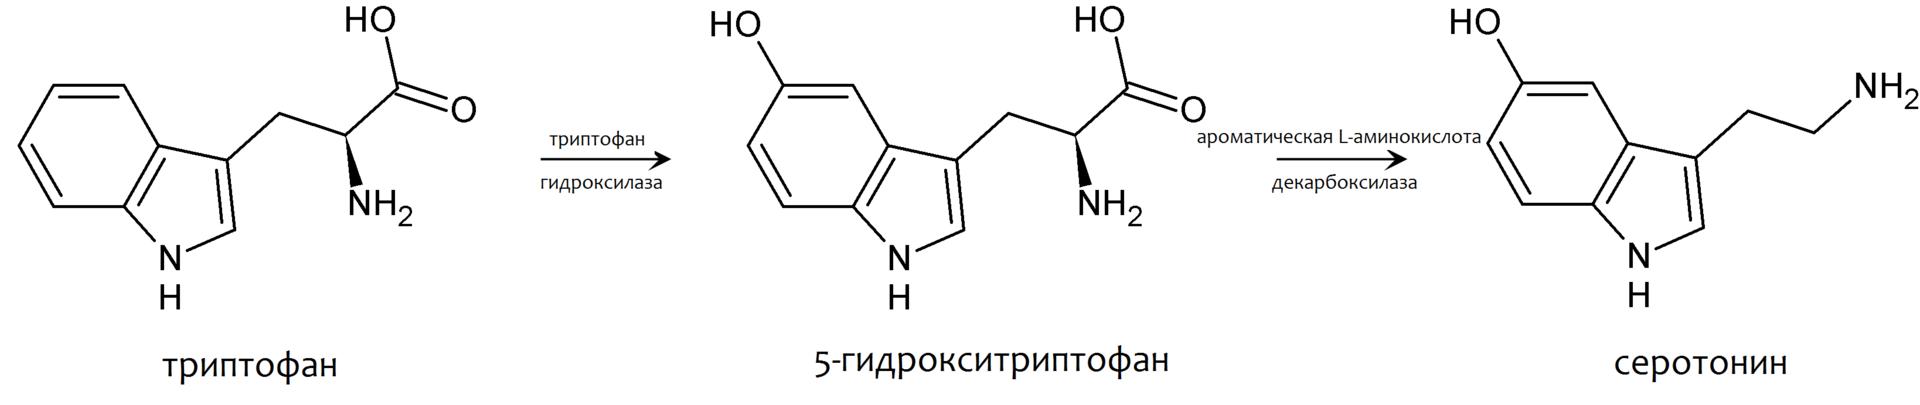 Синтез серотонина из 5 гидрокситриптофана